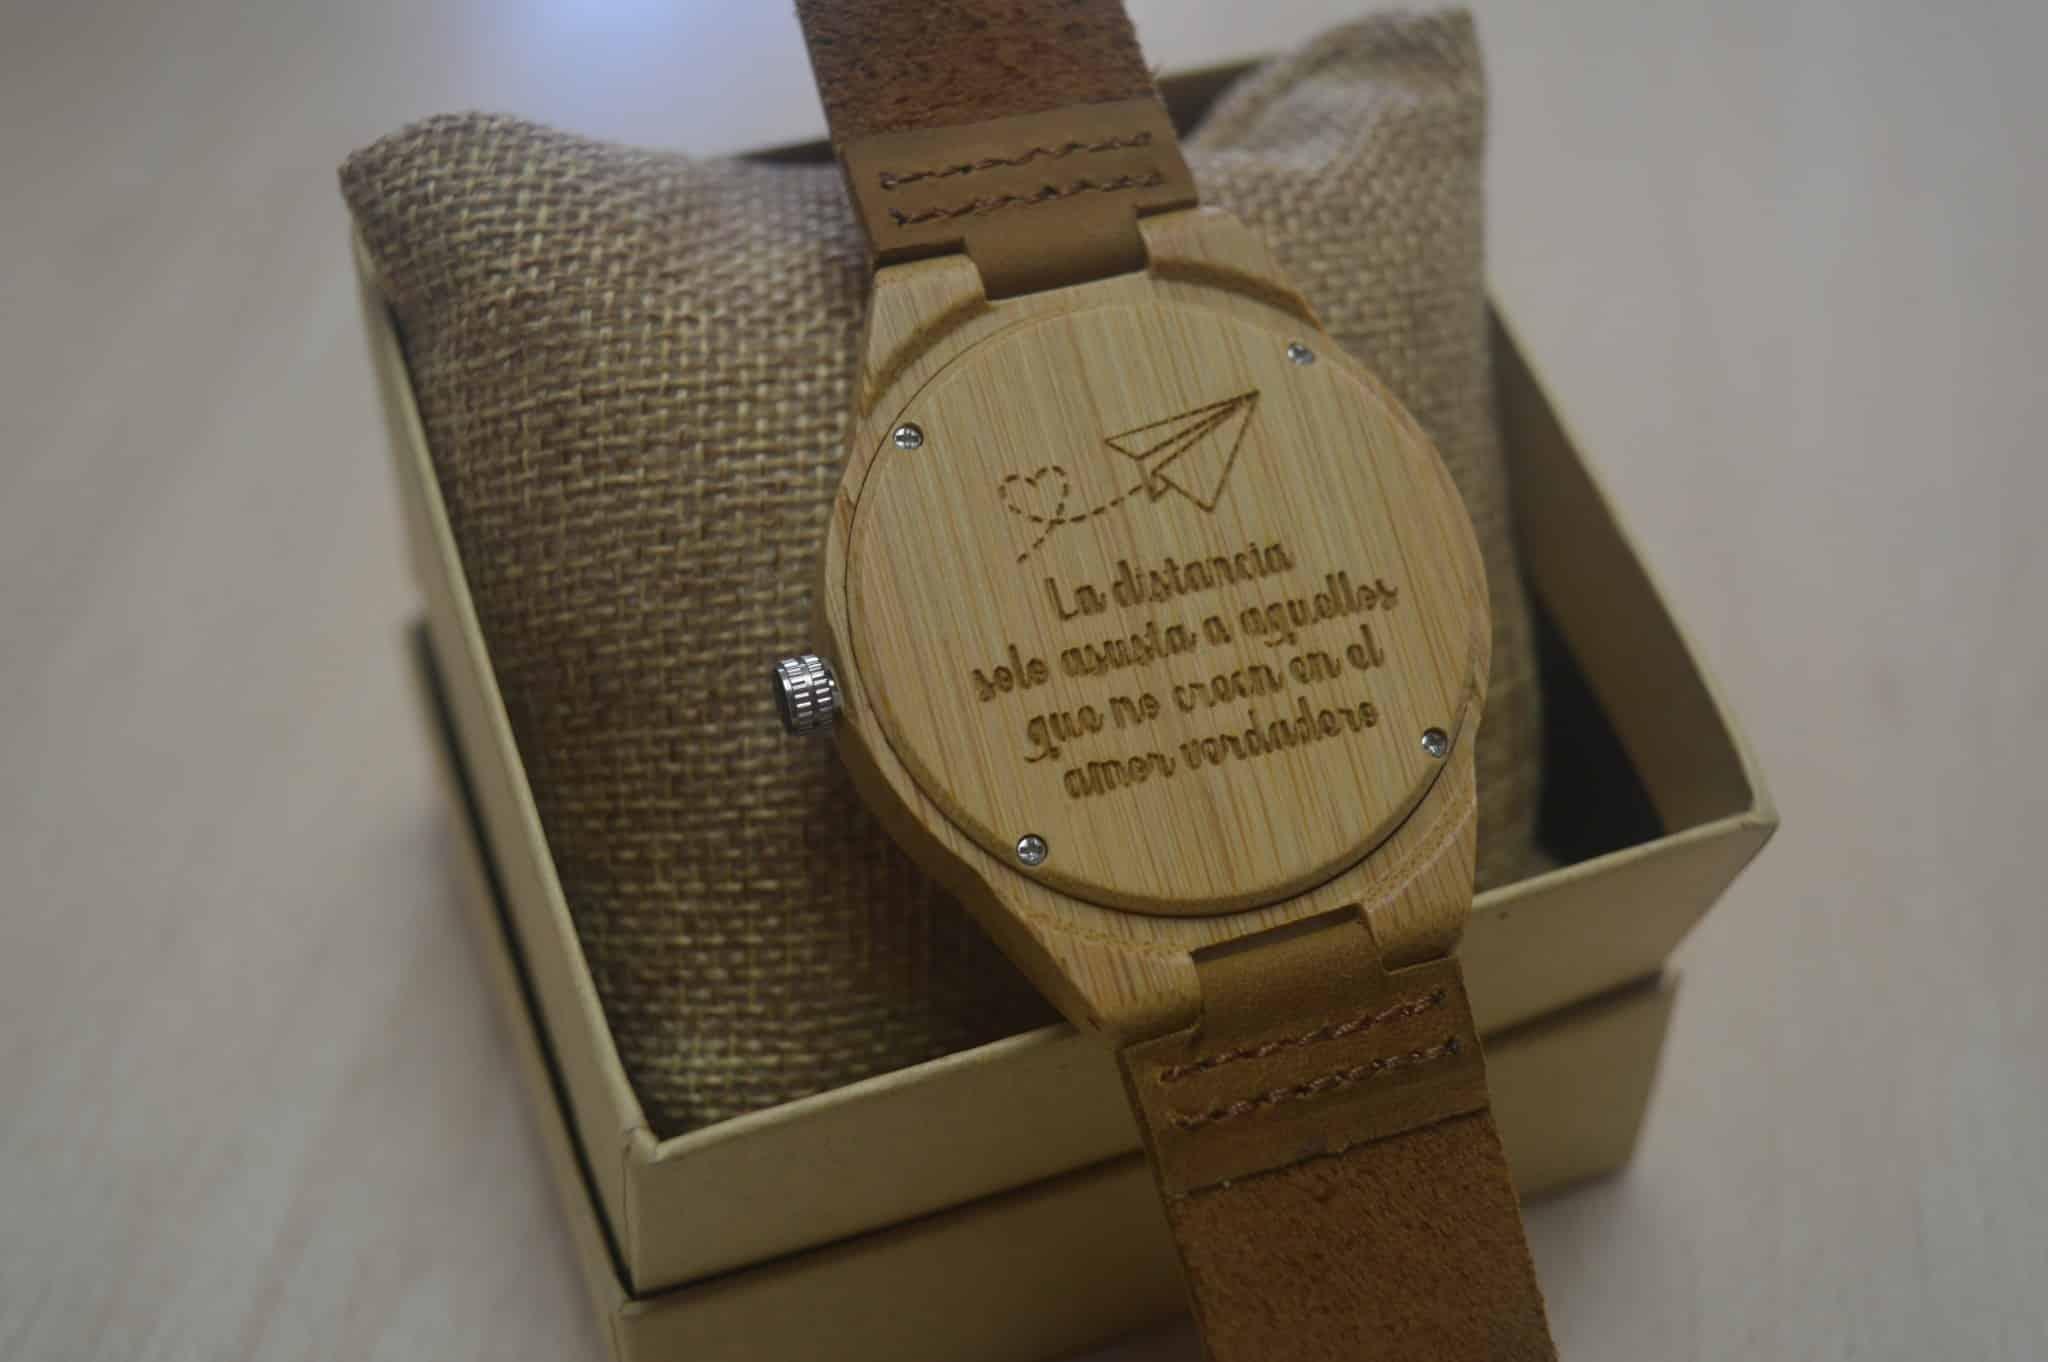 Frases para regalar un reloj a tu pareja - Relojes originales de pared ...